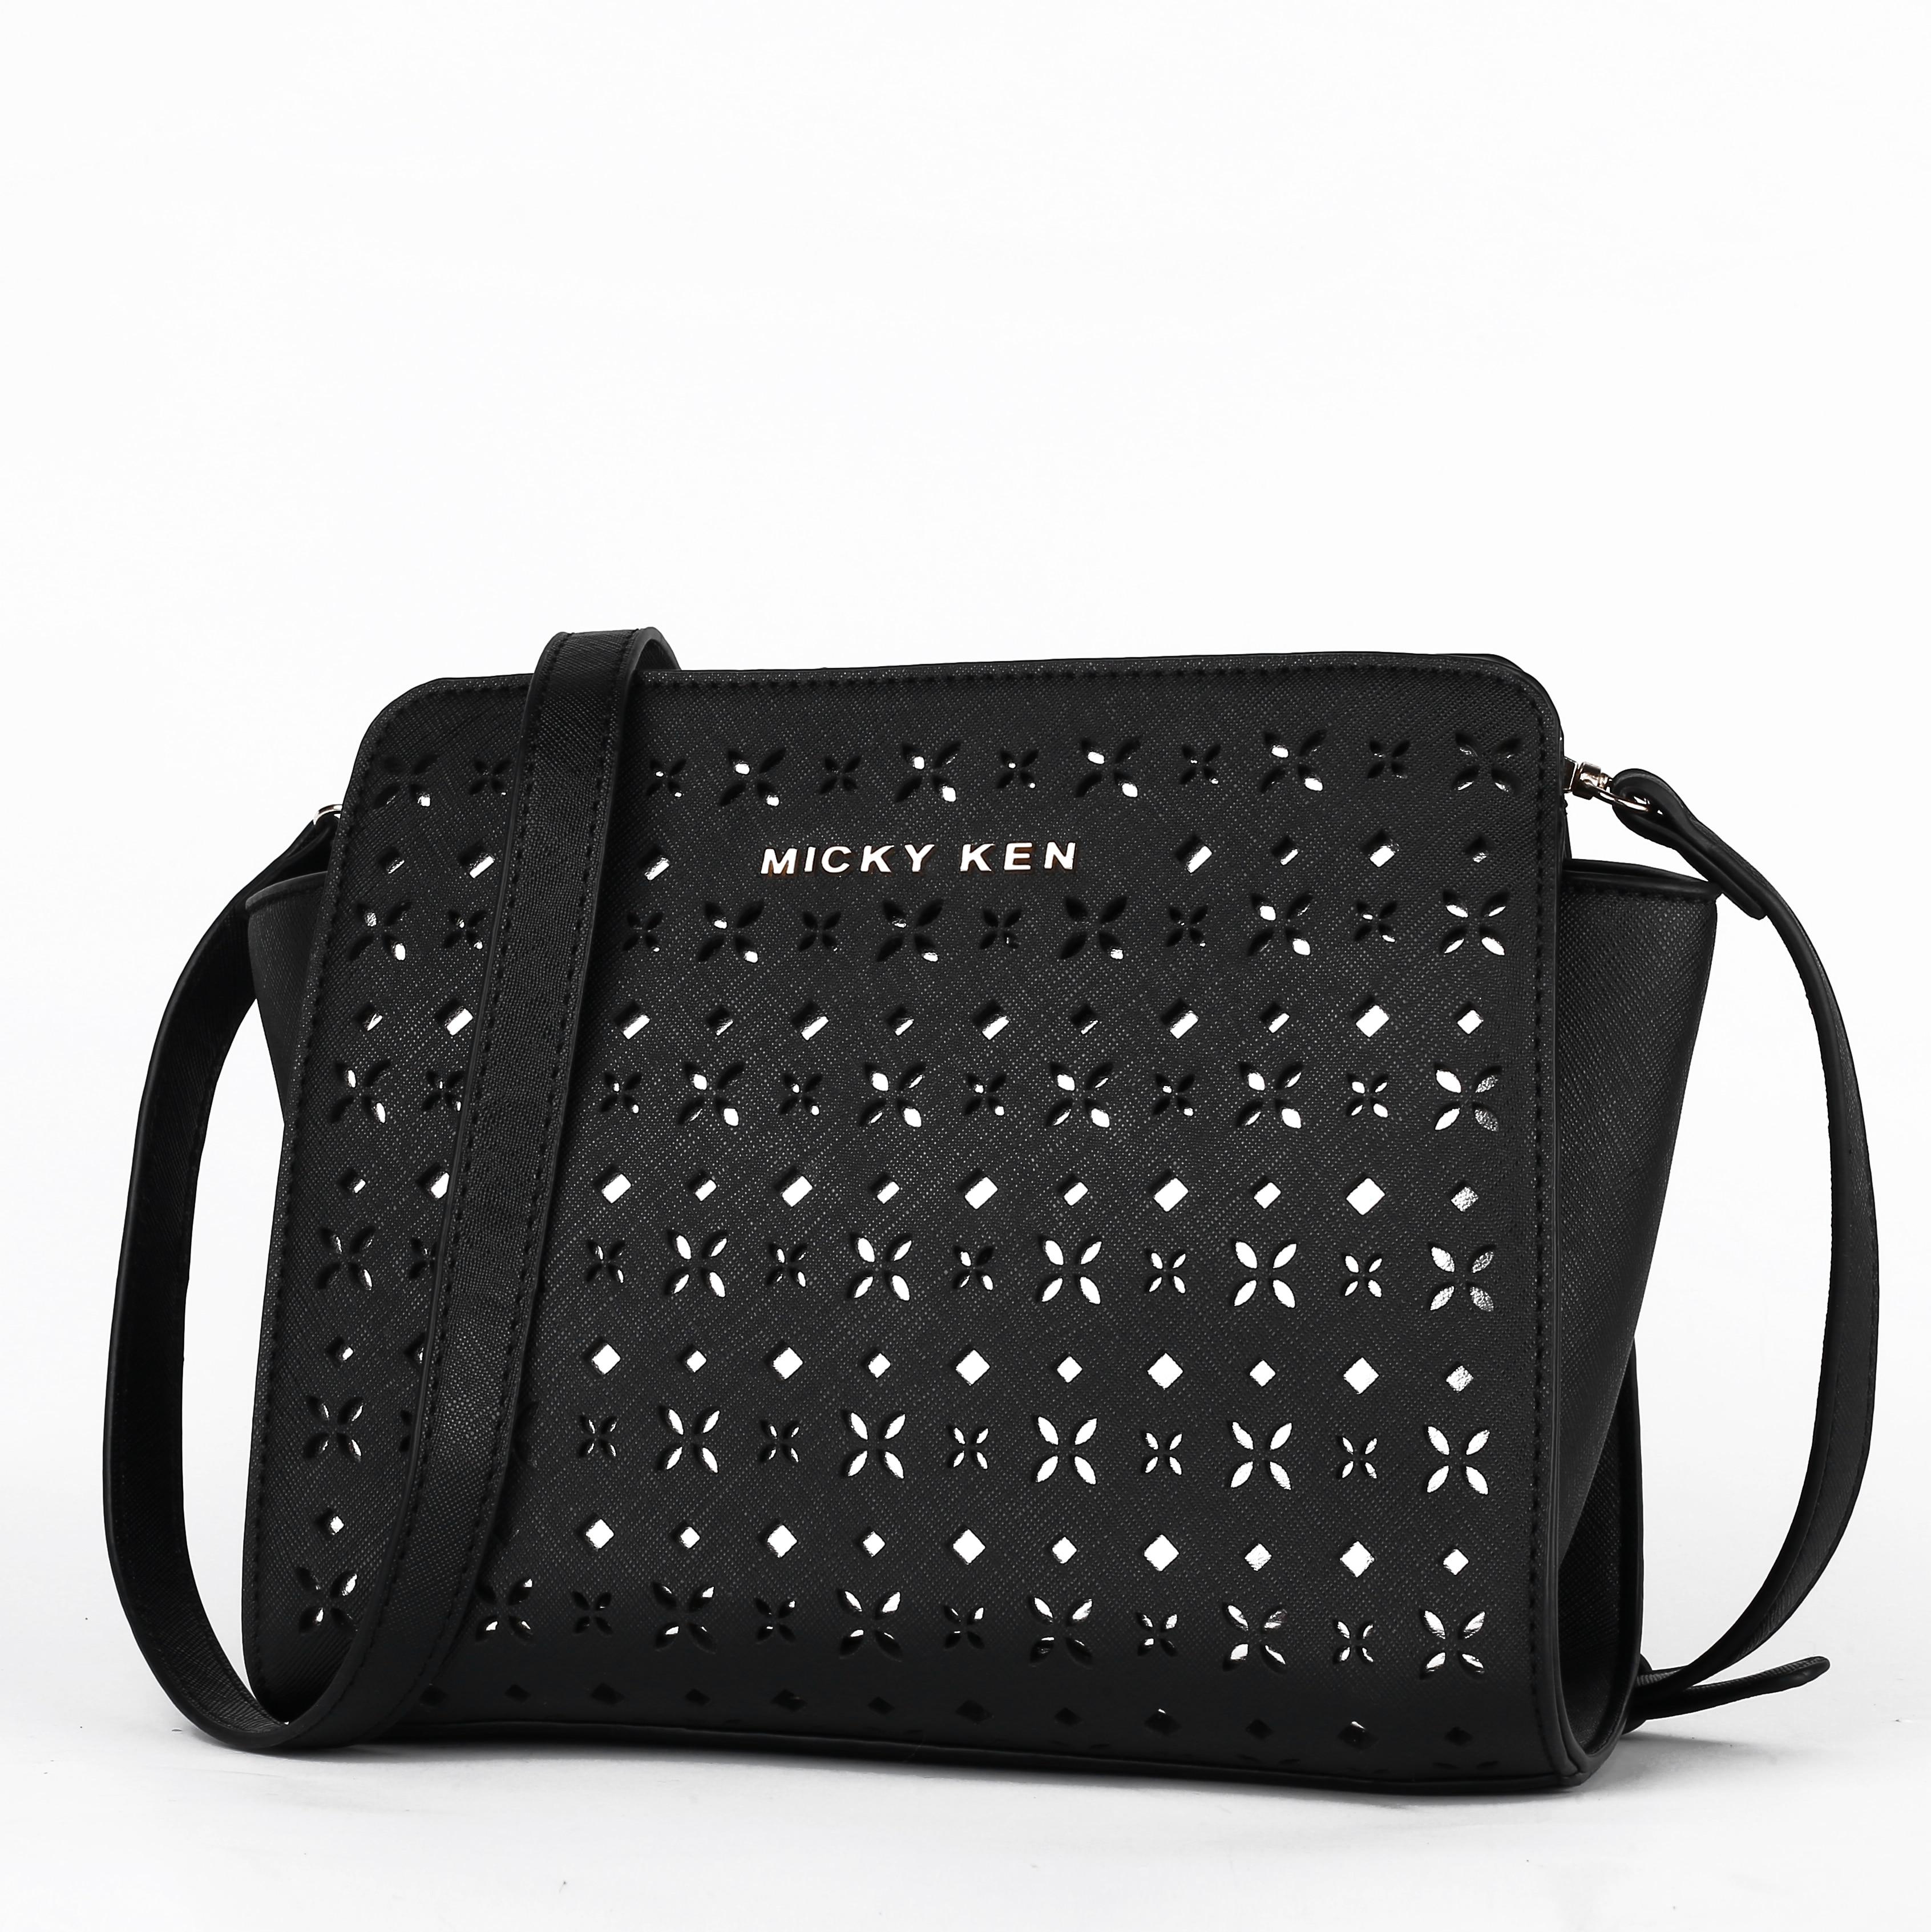 Casual Women Hollow Out Handbags Sale Women Evening Ladies Party Crossbody Shoulder Messenger Bags Shopping Handbag